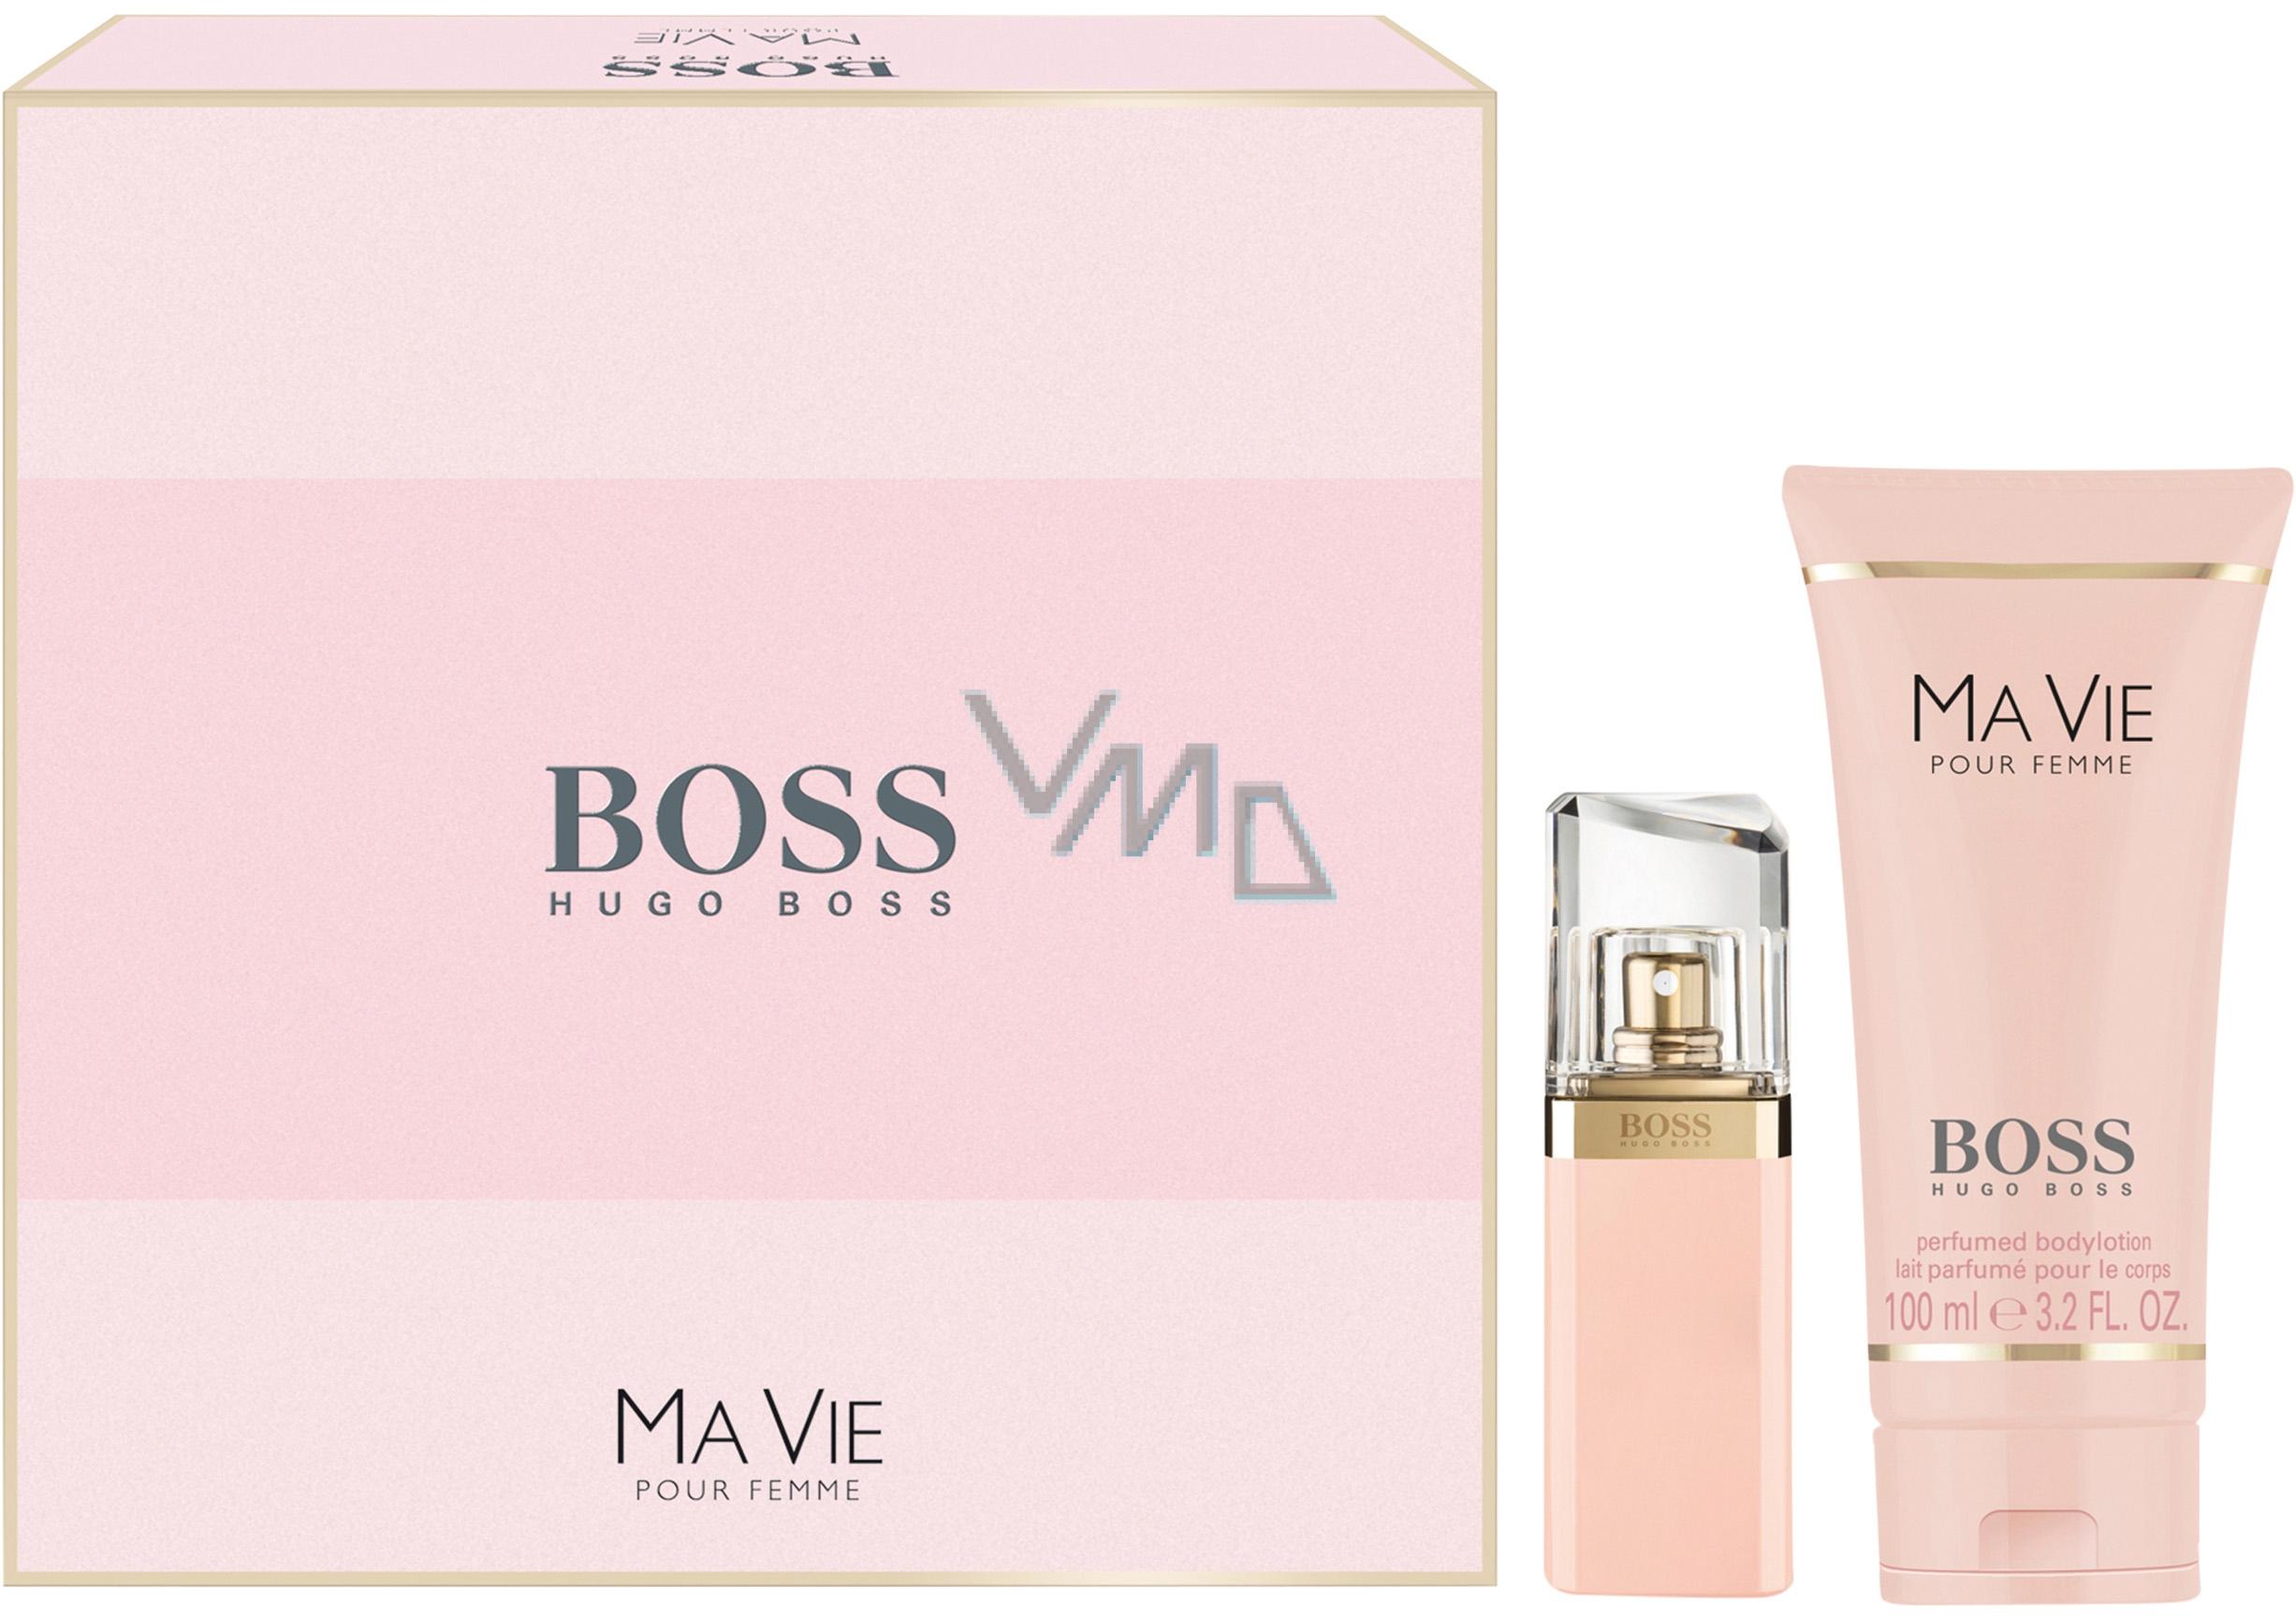 Hugo Boss Ma Vie pour Femme parfémovaná voda 30 ml + tělové mléko 100 ml, dárková sada